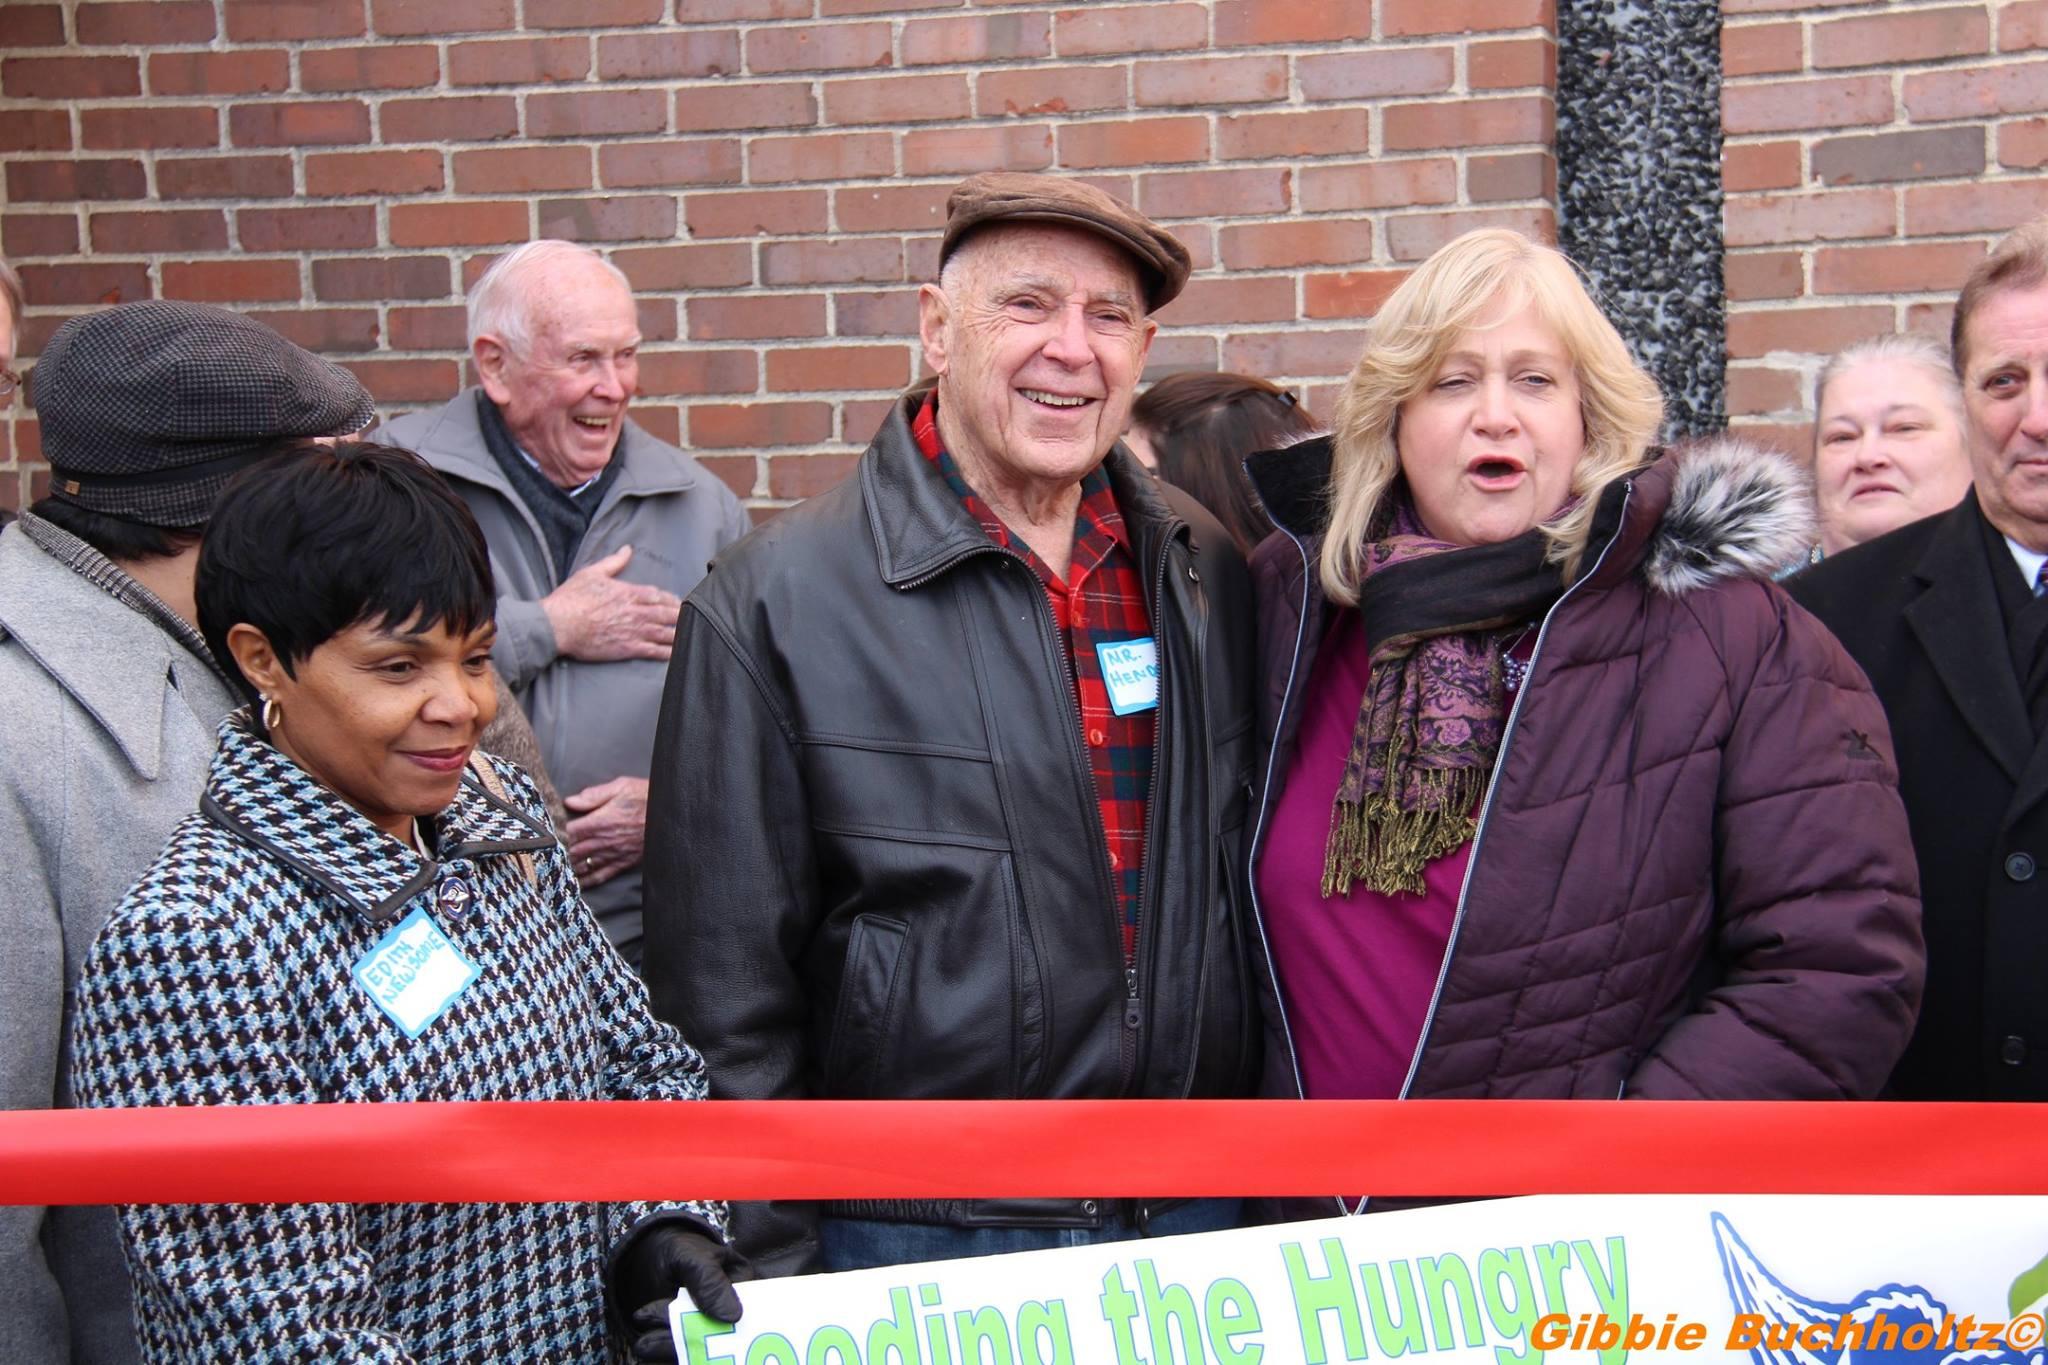 Don Henderson (Left) with Diane Thackston Feb. 12, 2016